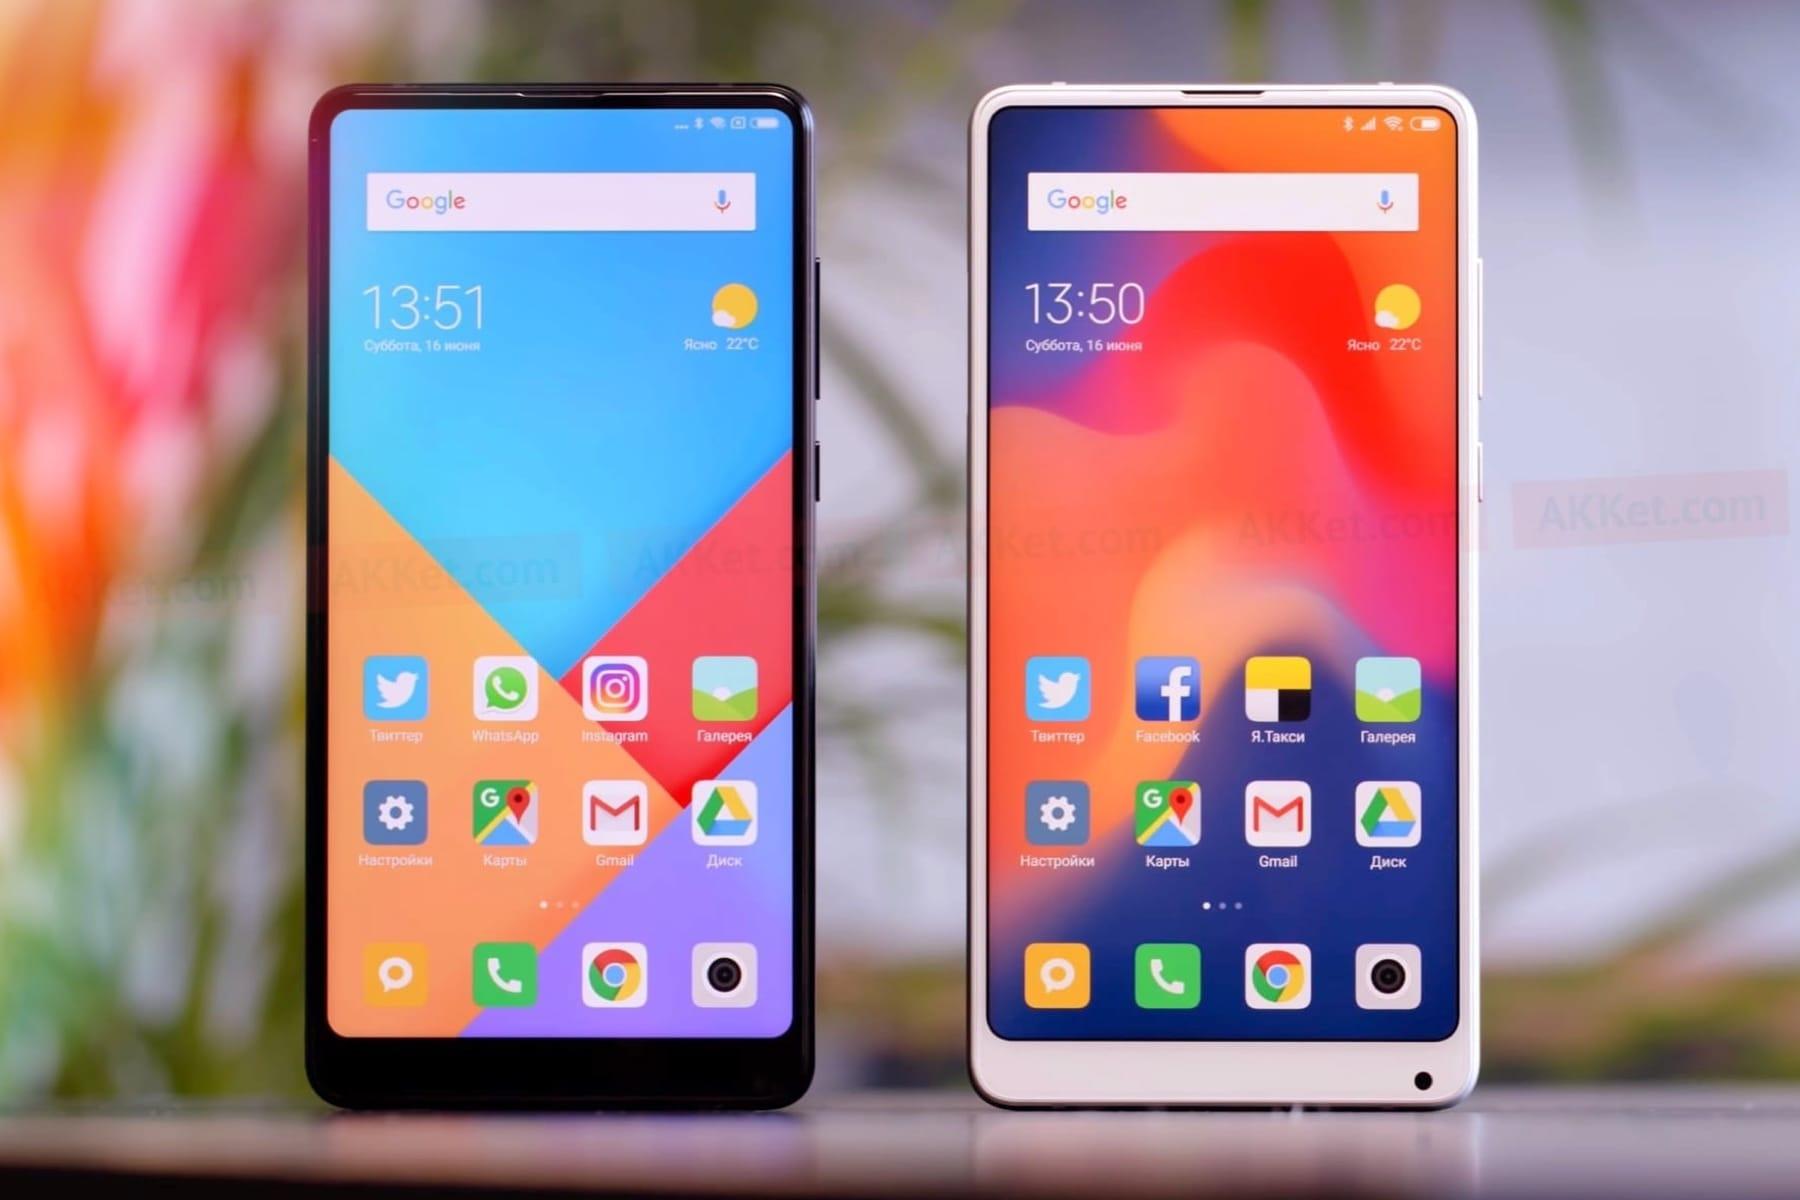 Xiaomi smartphones that will upgrade to MIUI 11 firmware in 2019